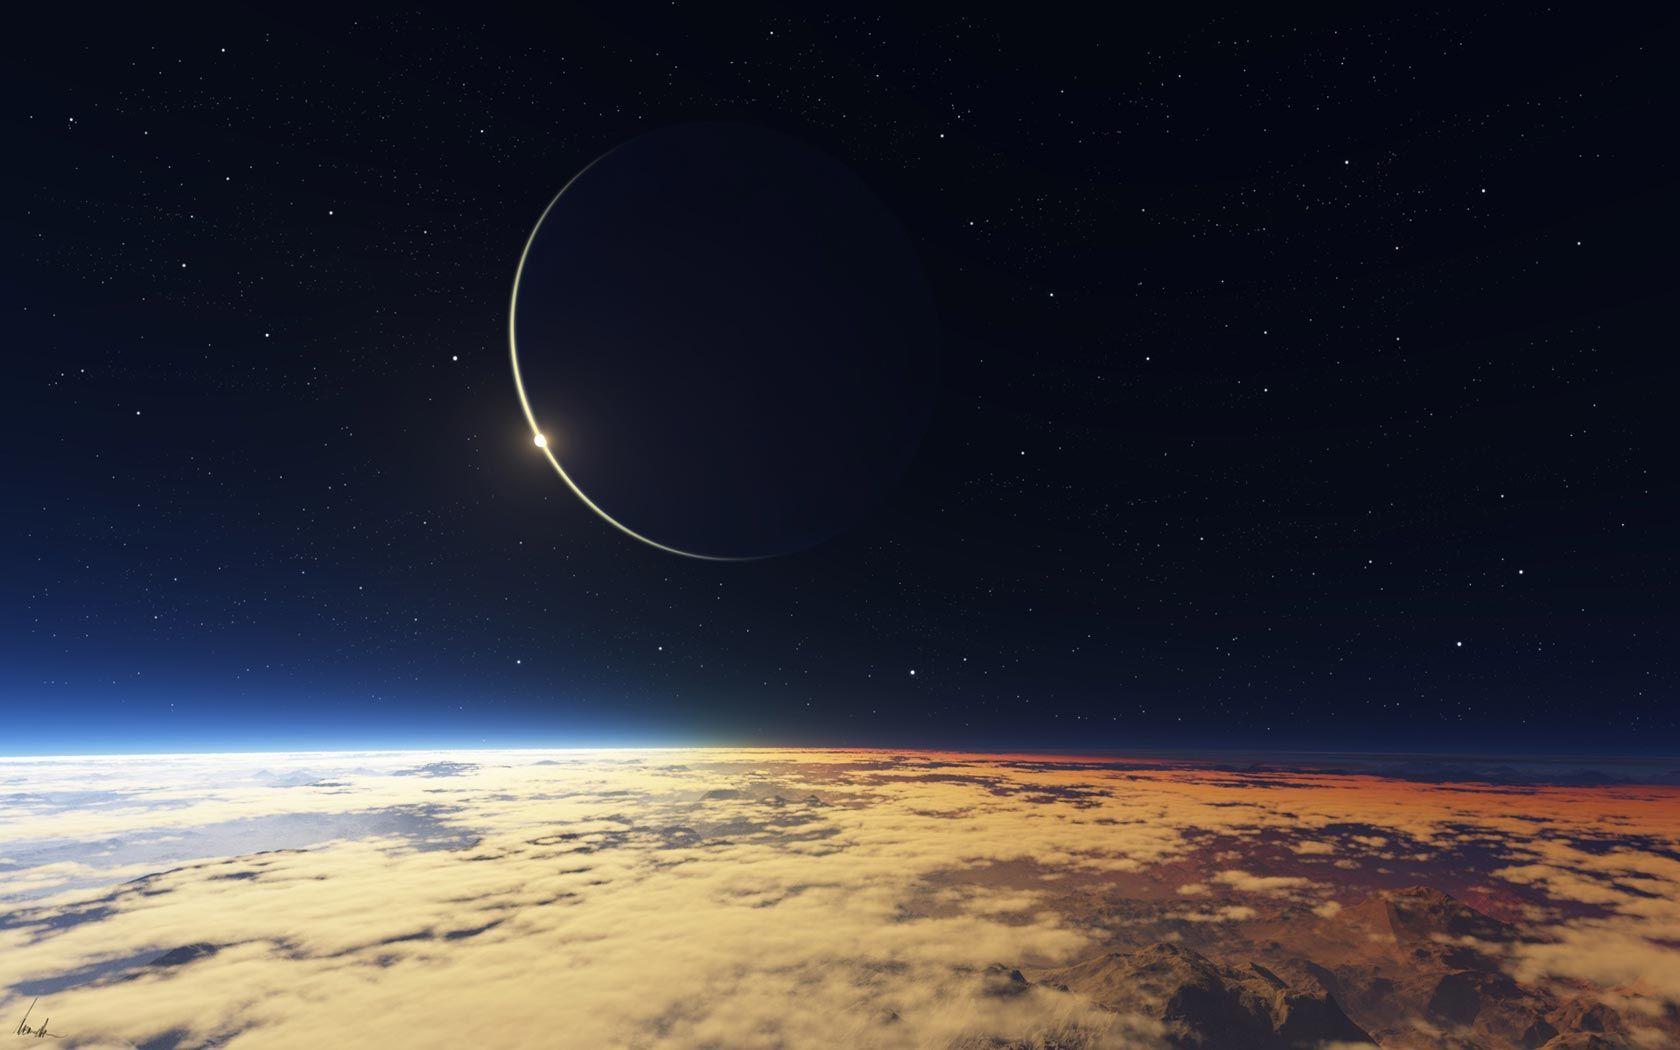 Hd wallpaper moon - Moon Eclipse Hd Background Wallpaper